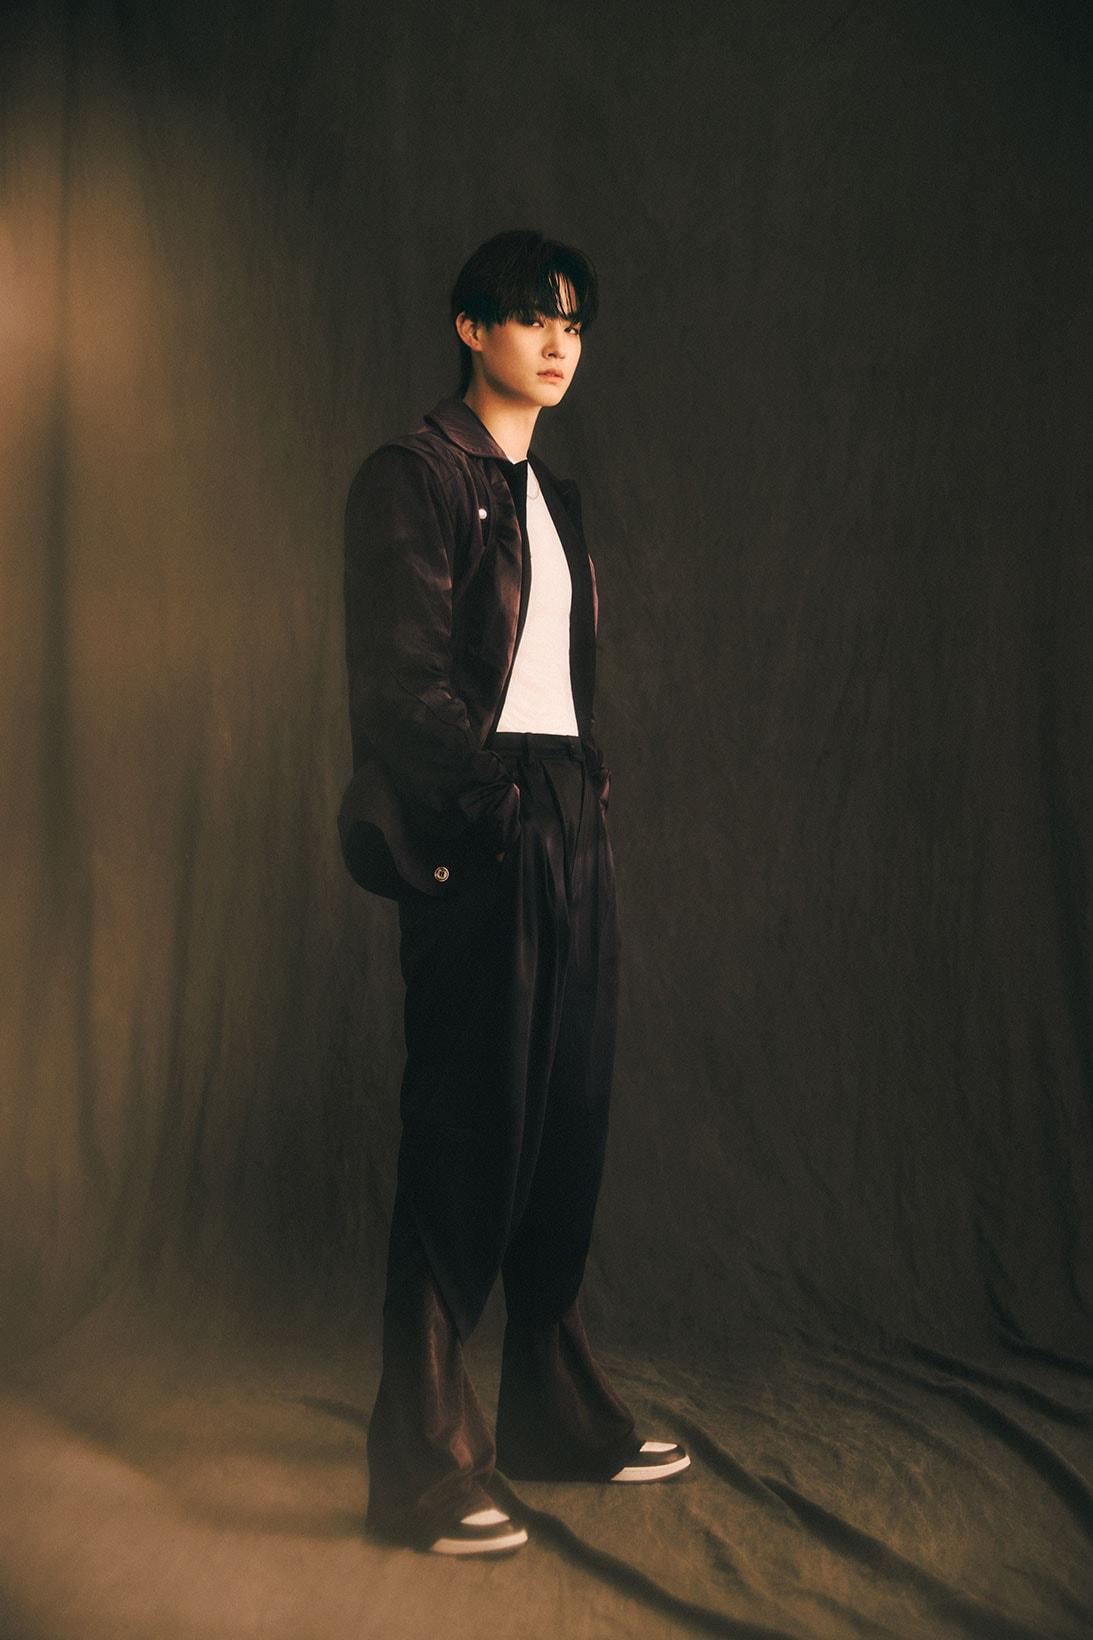 jay b got7 h1ghr music label single switch it up k-pop korean hip hop release interview